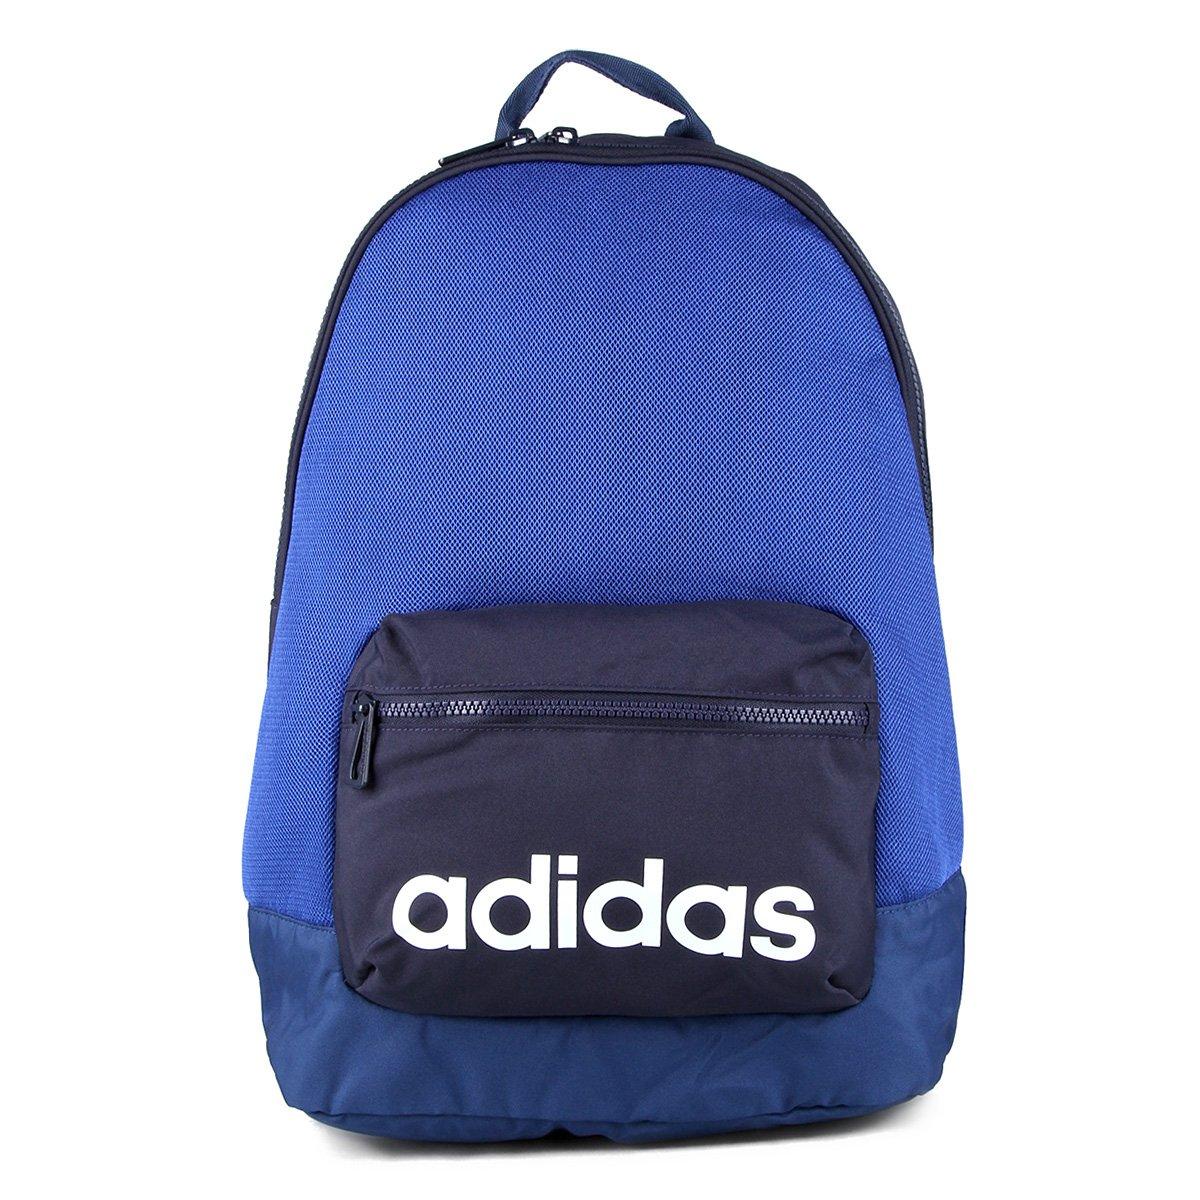 c8c93511041 Mochila Adidas Daily Girl Feminina - Compre Agora